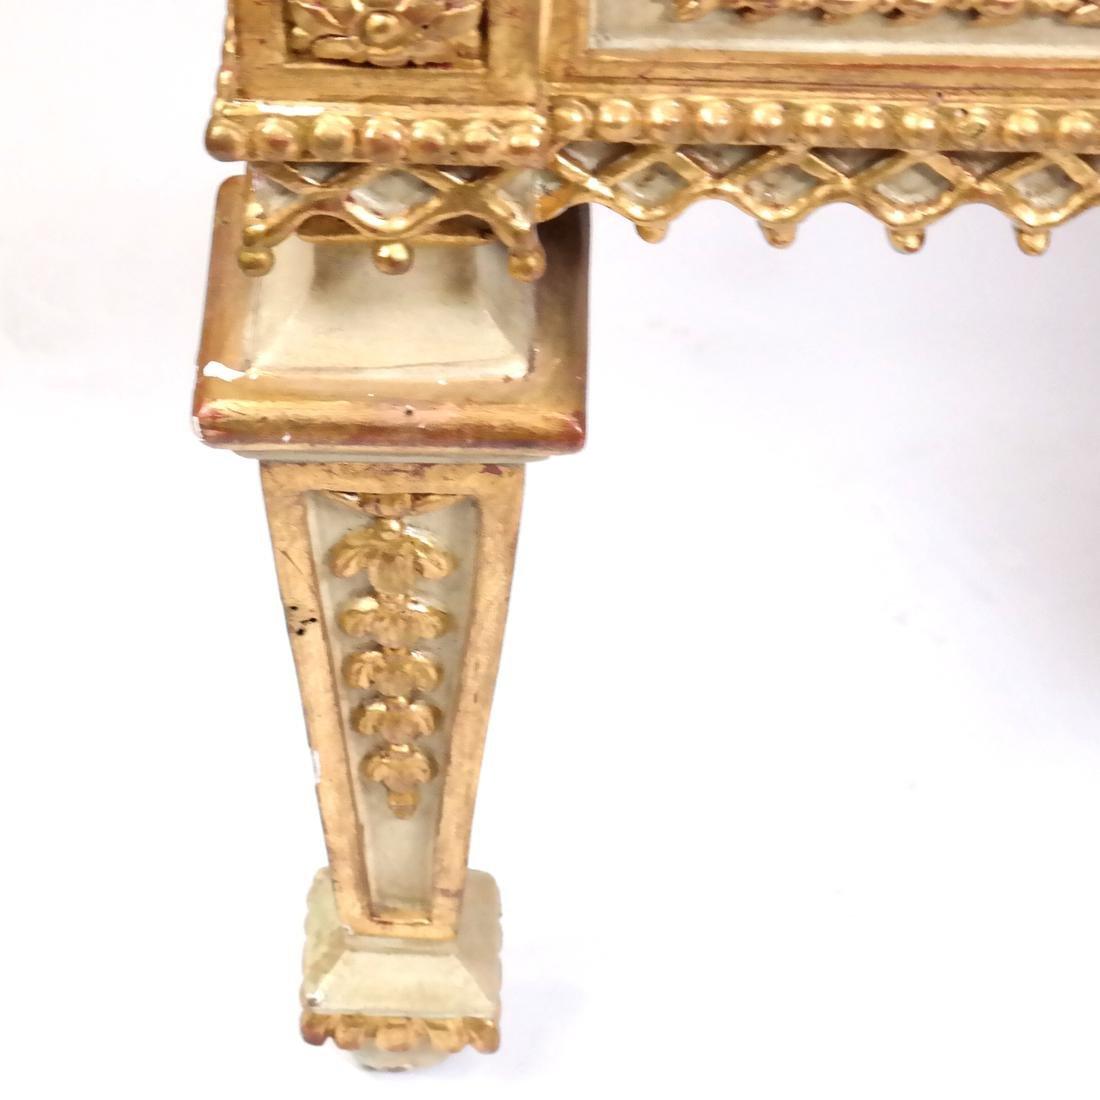 Pair of 19th Century Classical Stools - 6